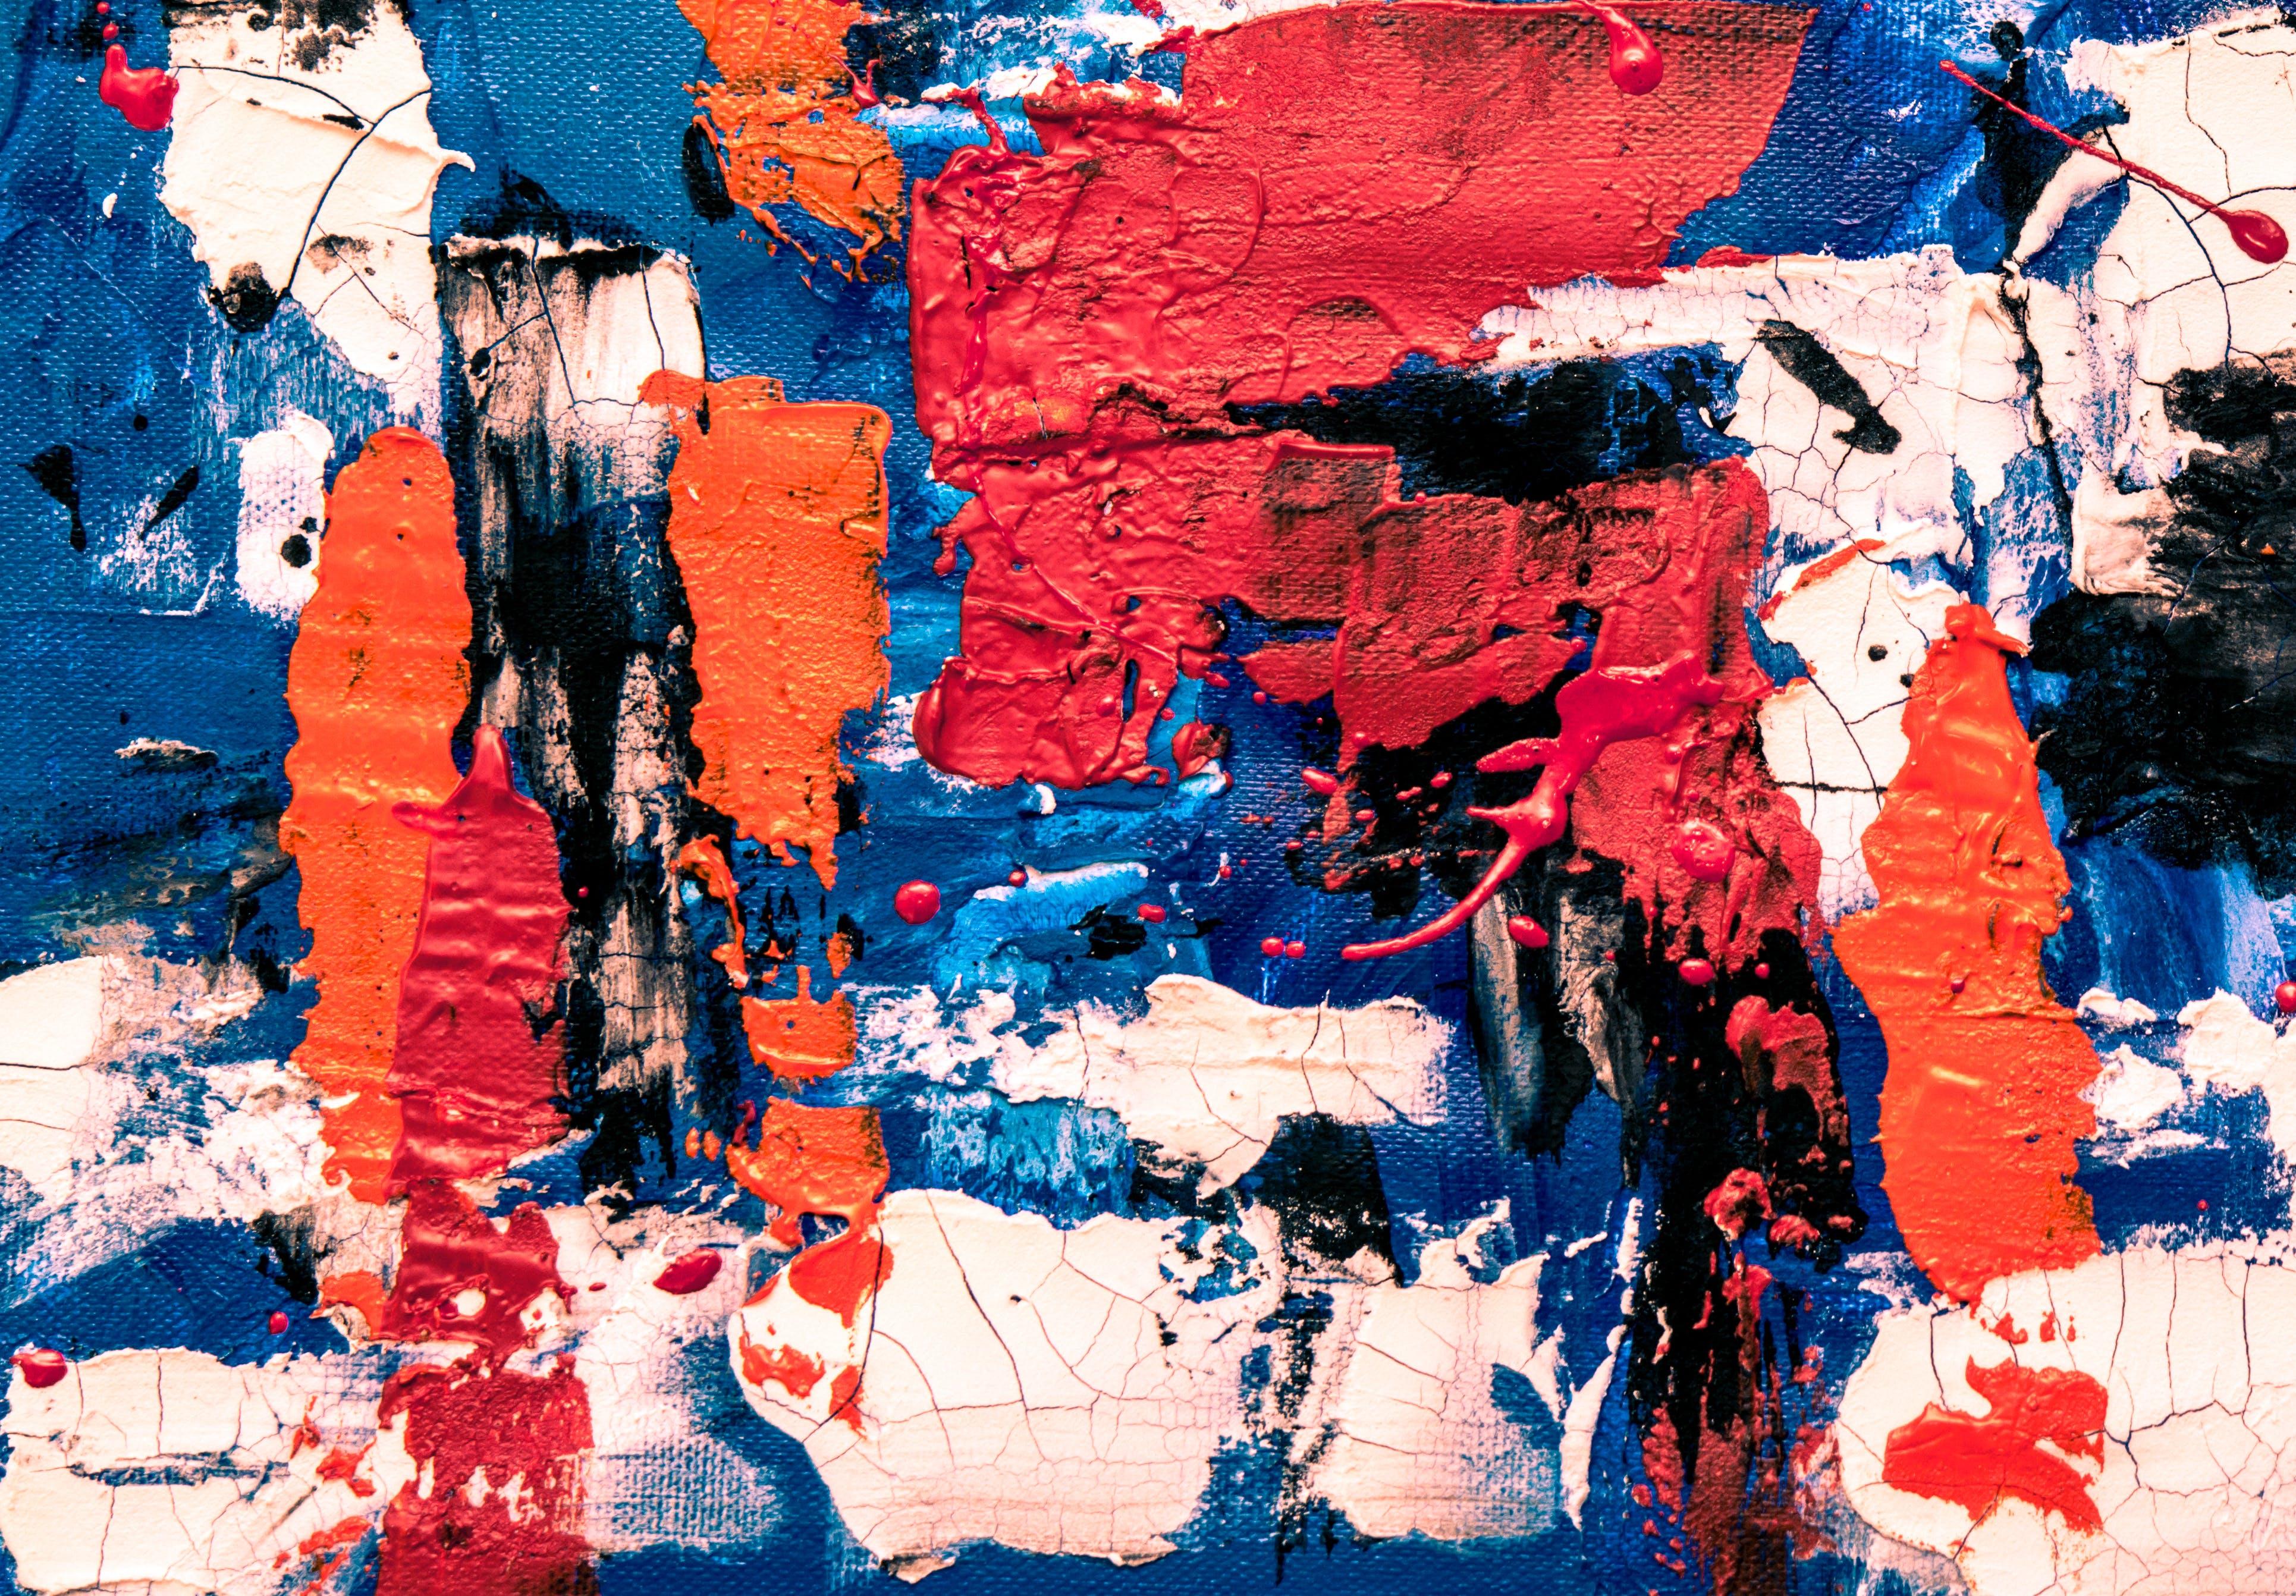 4k-baggrund, abstrakt maleri, akrylmaling